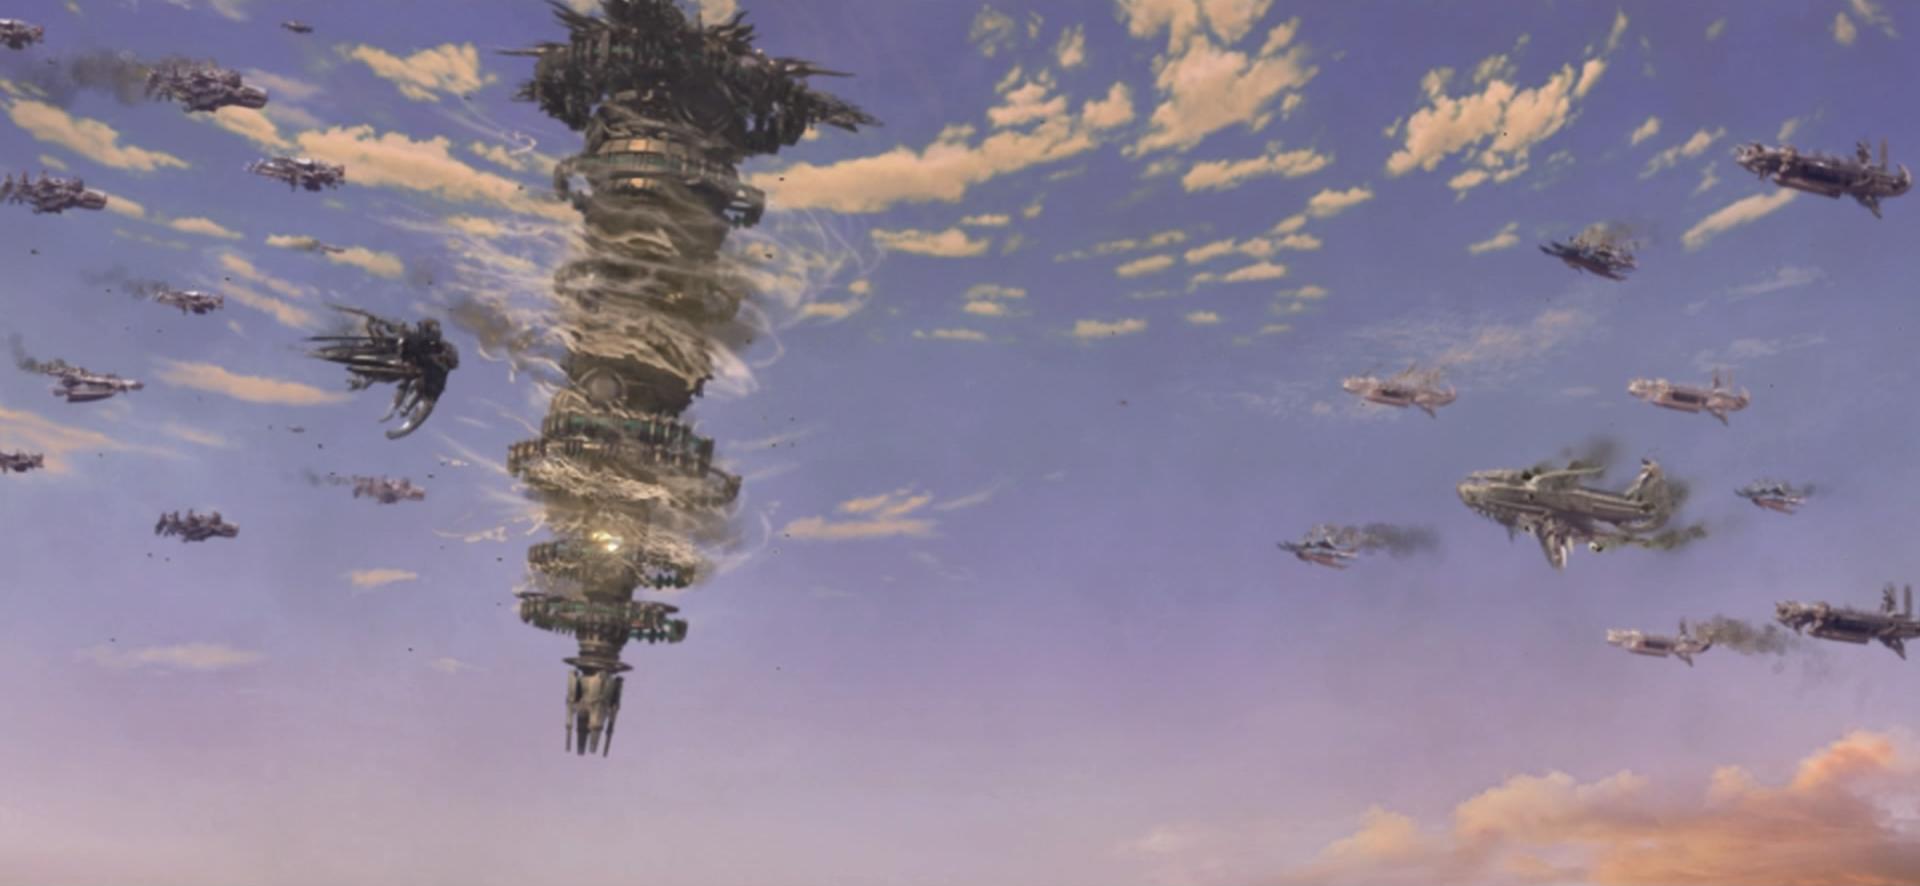 Sky Fortress Bahamut